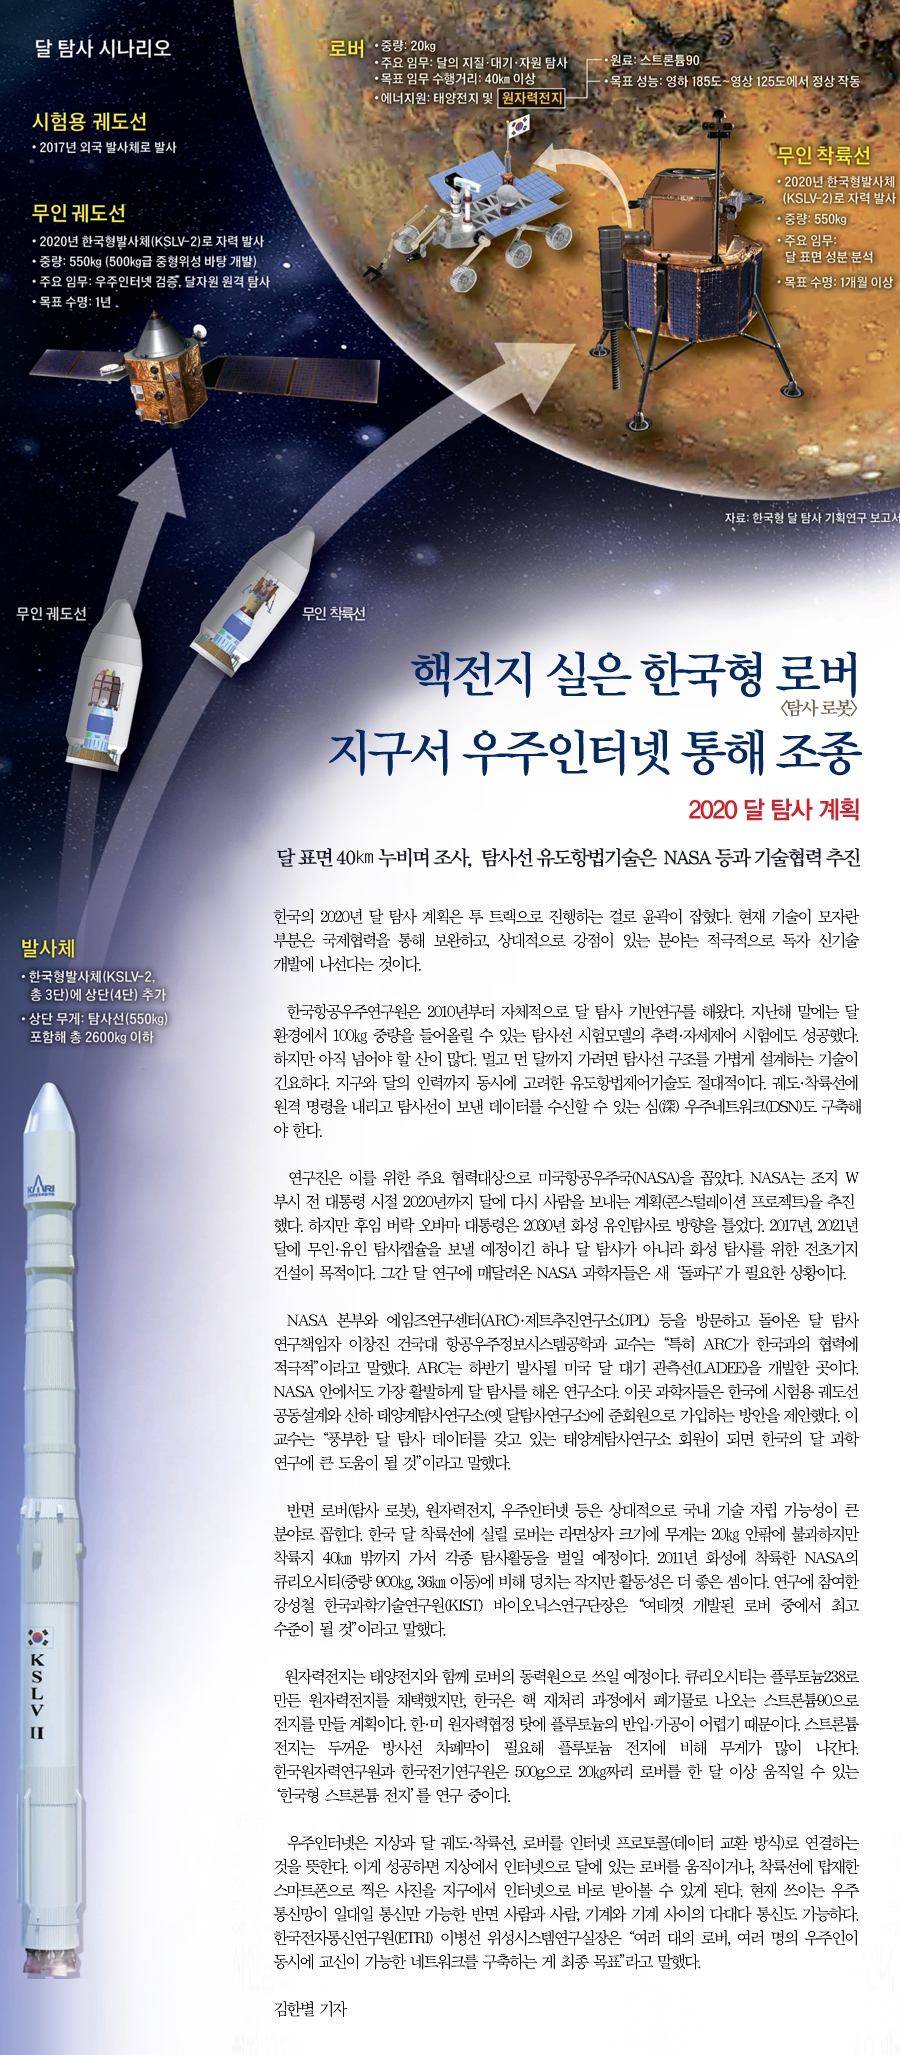 South Korea lunar mission infographic (Credits:  Joongang Ilbo).